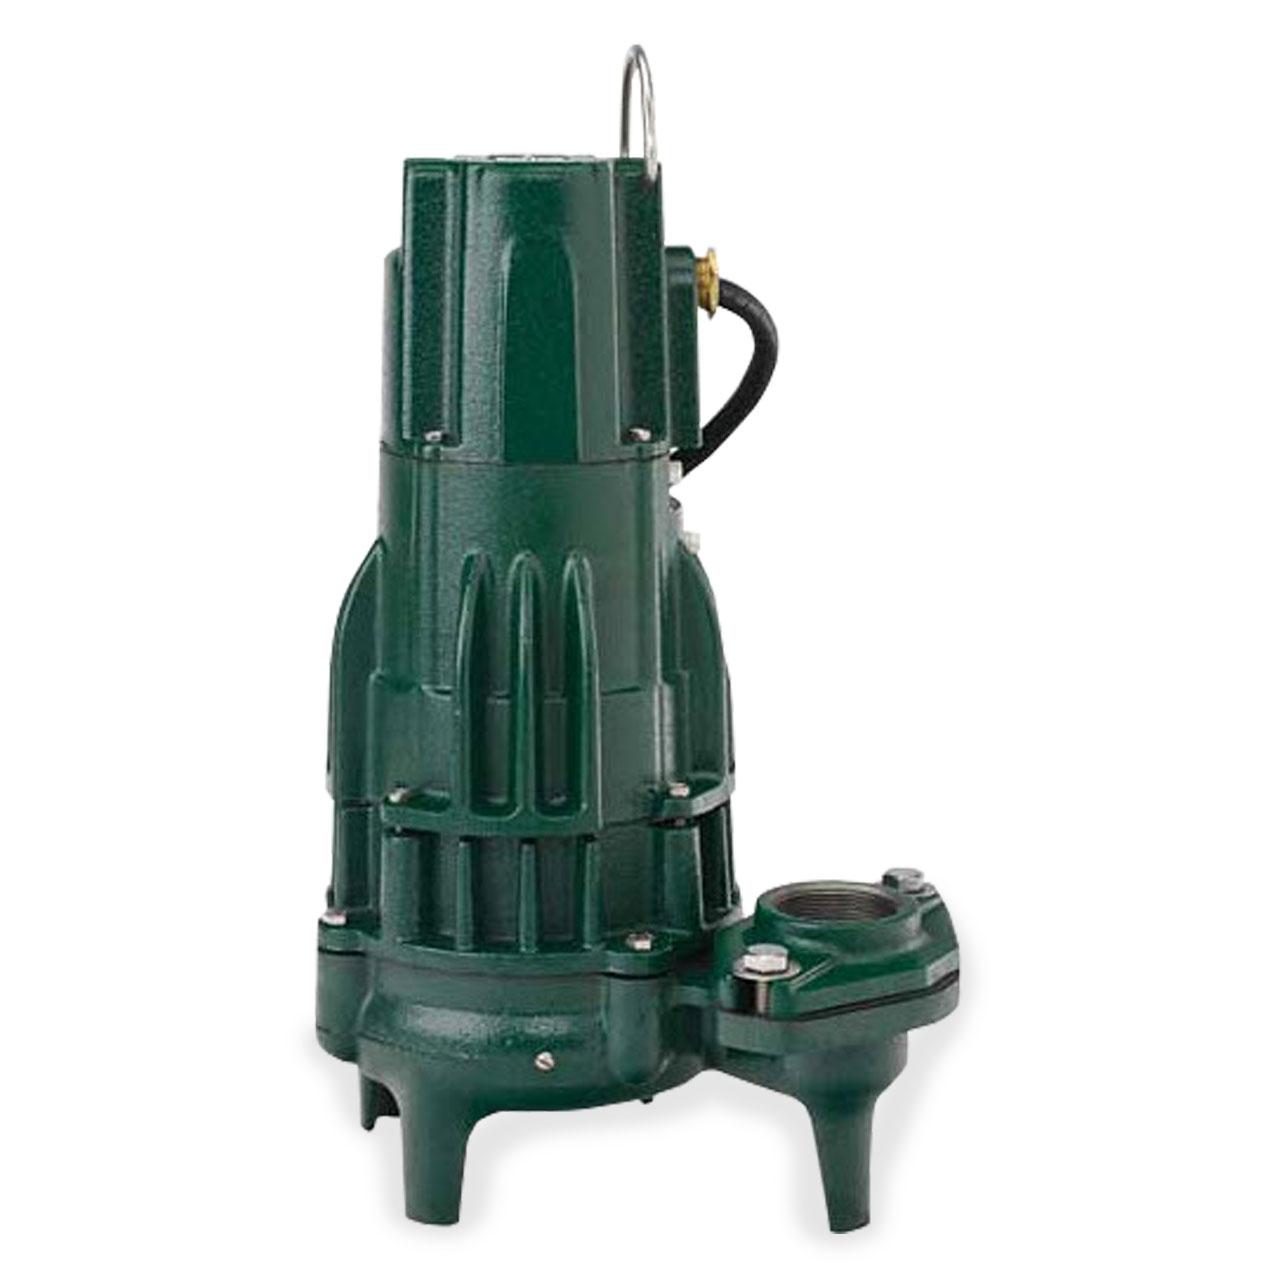 Zoeller 294 0004 Model E294 High Head Sewage Dewatering Septic Pump Control Box Wiring Diagram Free Picture 15 Hp 230v 1ph 20 Cord Manual Zlr294